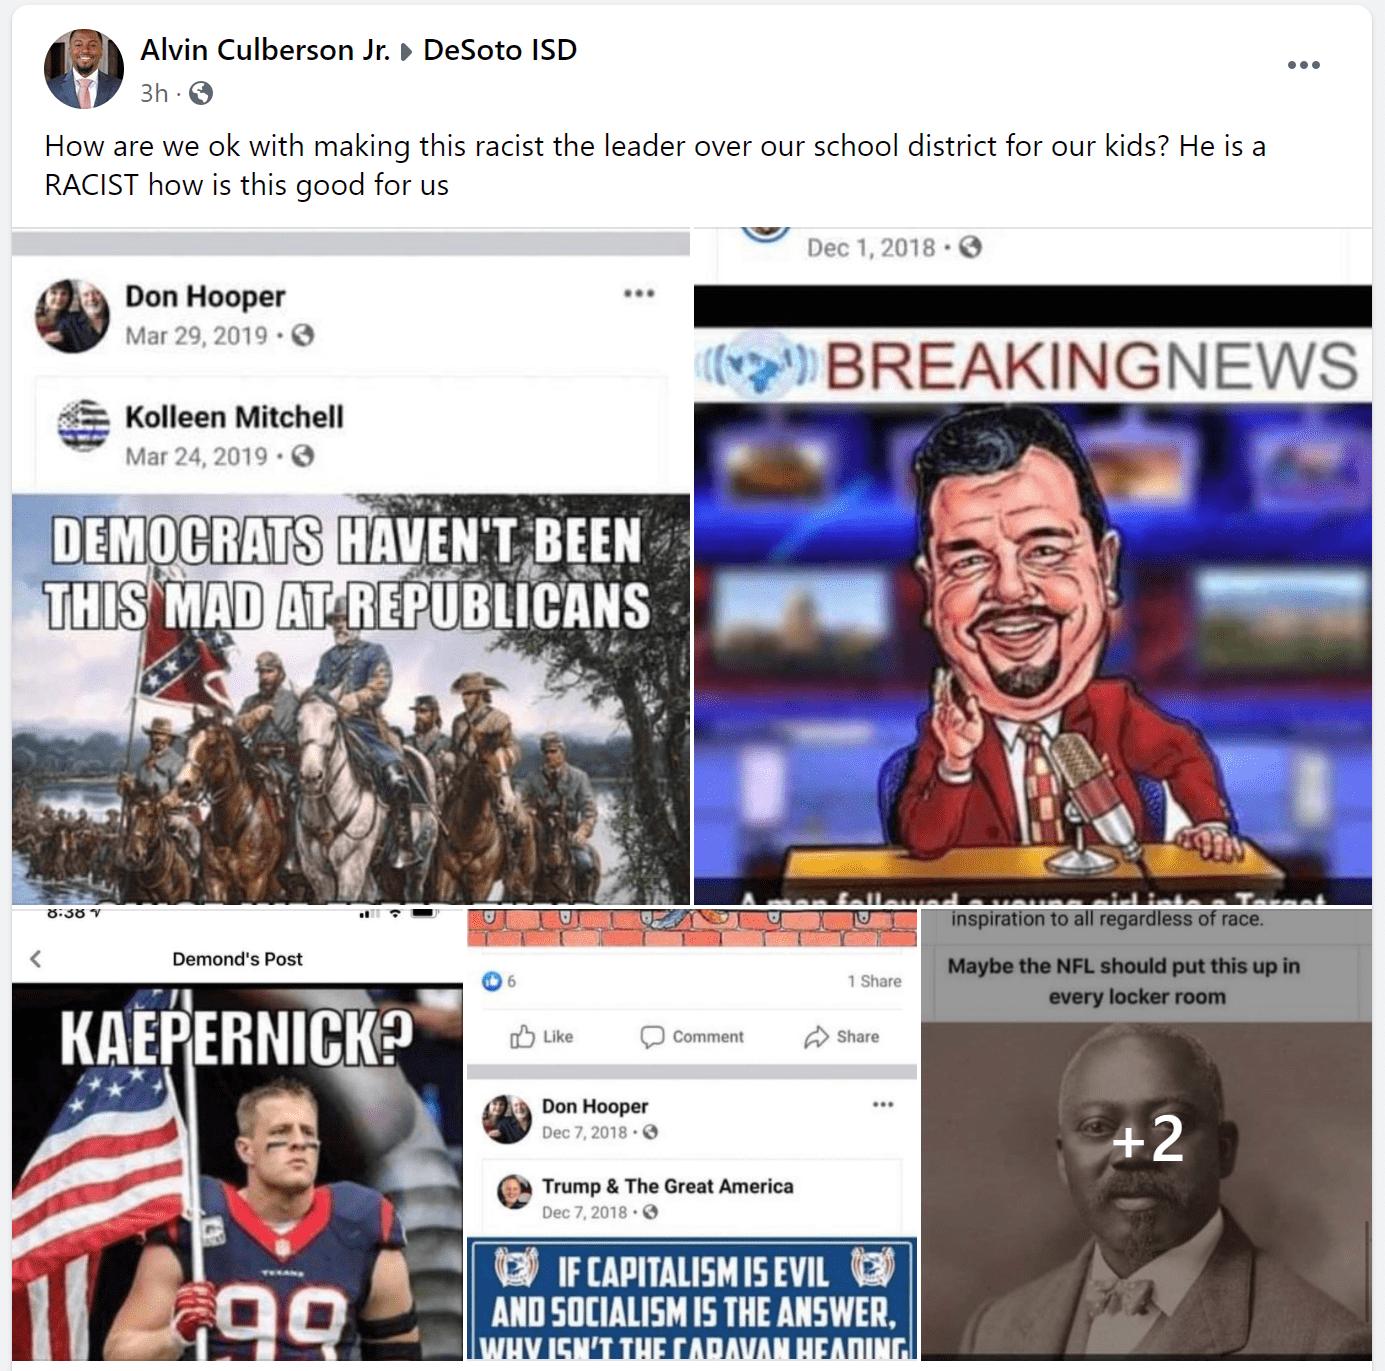 screenshot of facebook posts from Don Hooper